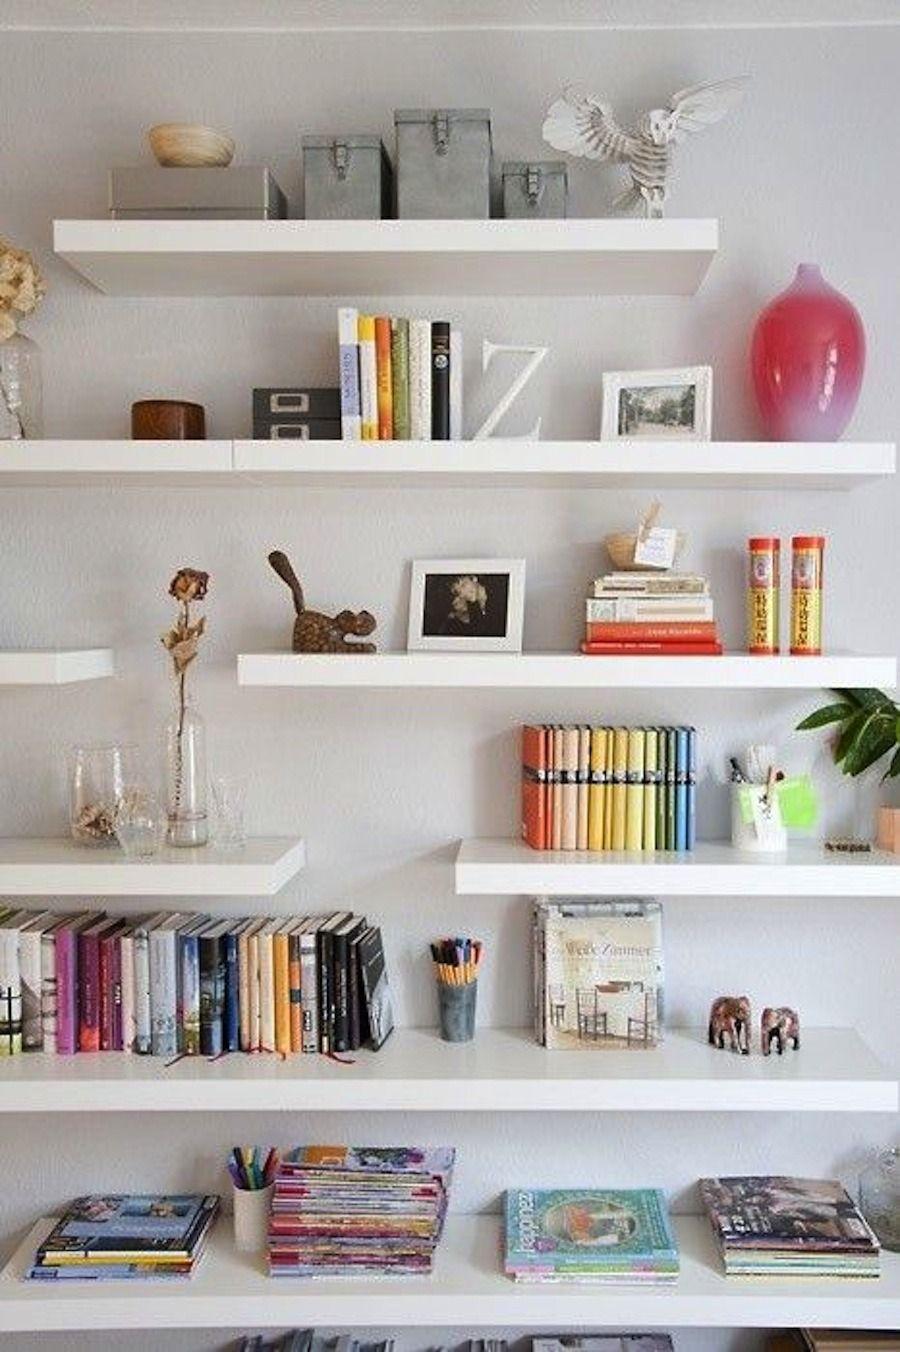 bookshelves office. #office, #bookshelf, #organization View Entire Slideshow: 20 Chic Ideas For An Organized Office On Http://www.stylemepretty.com/collection/329/ Bookshelves E